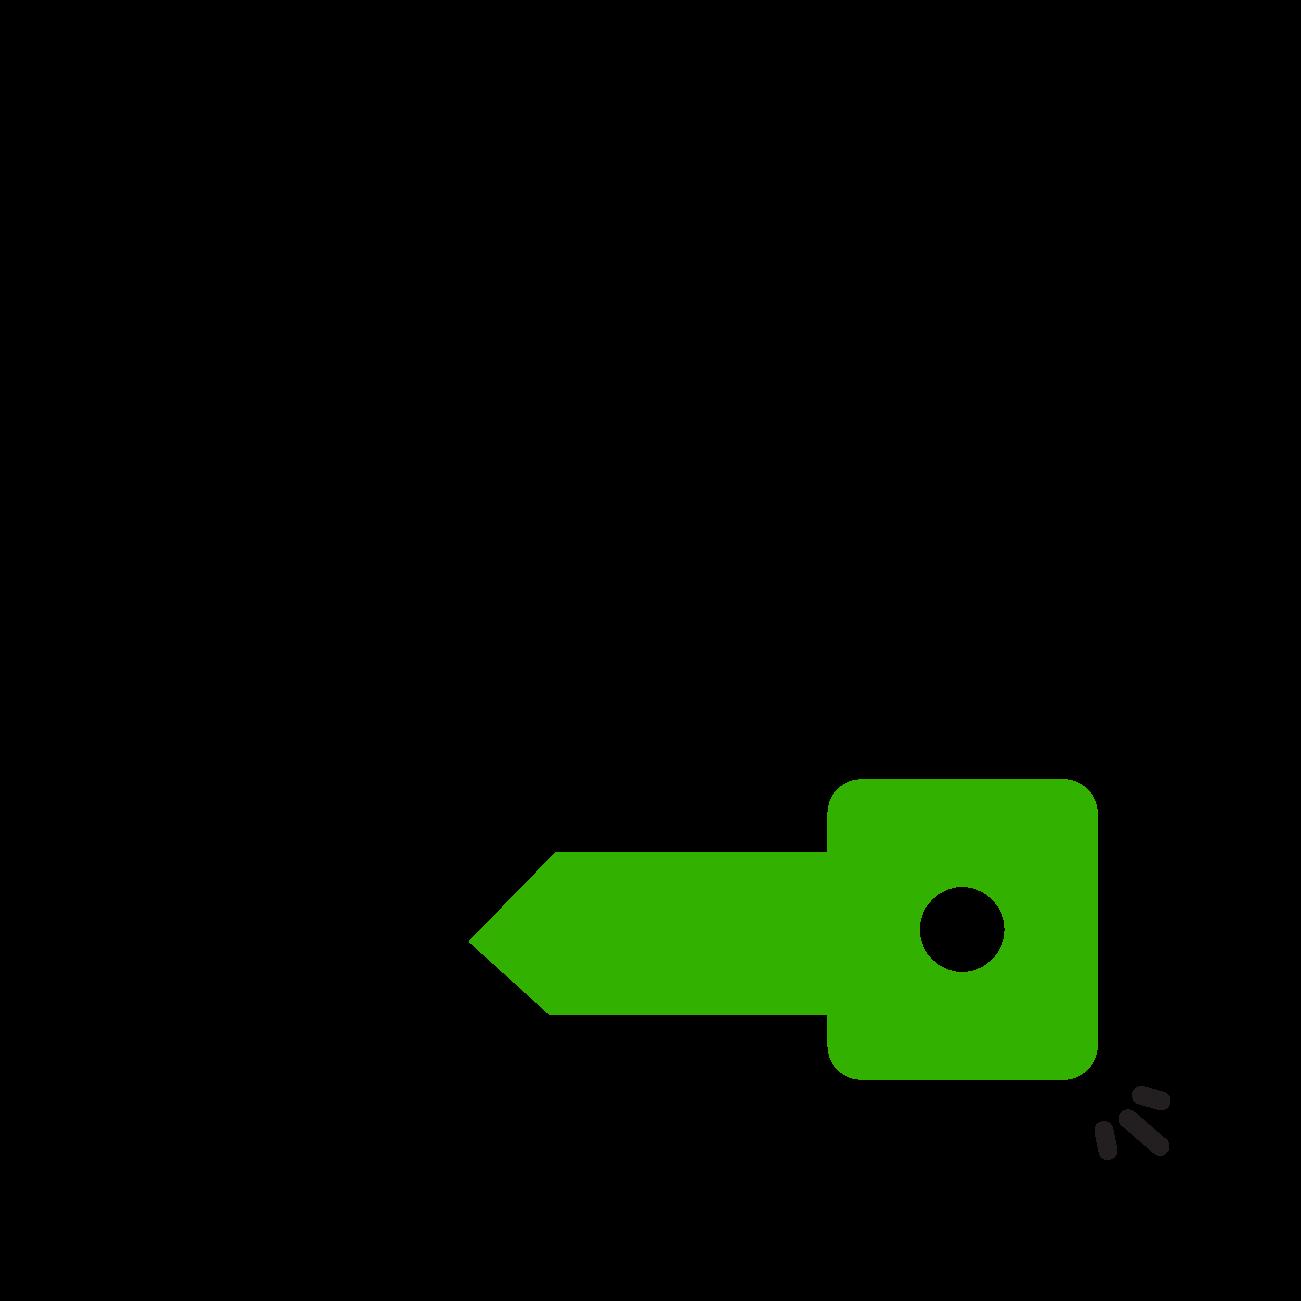 single login key icon